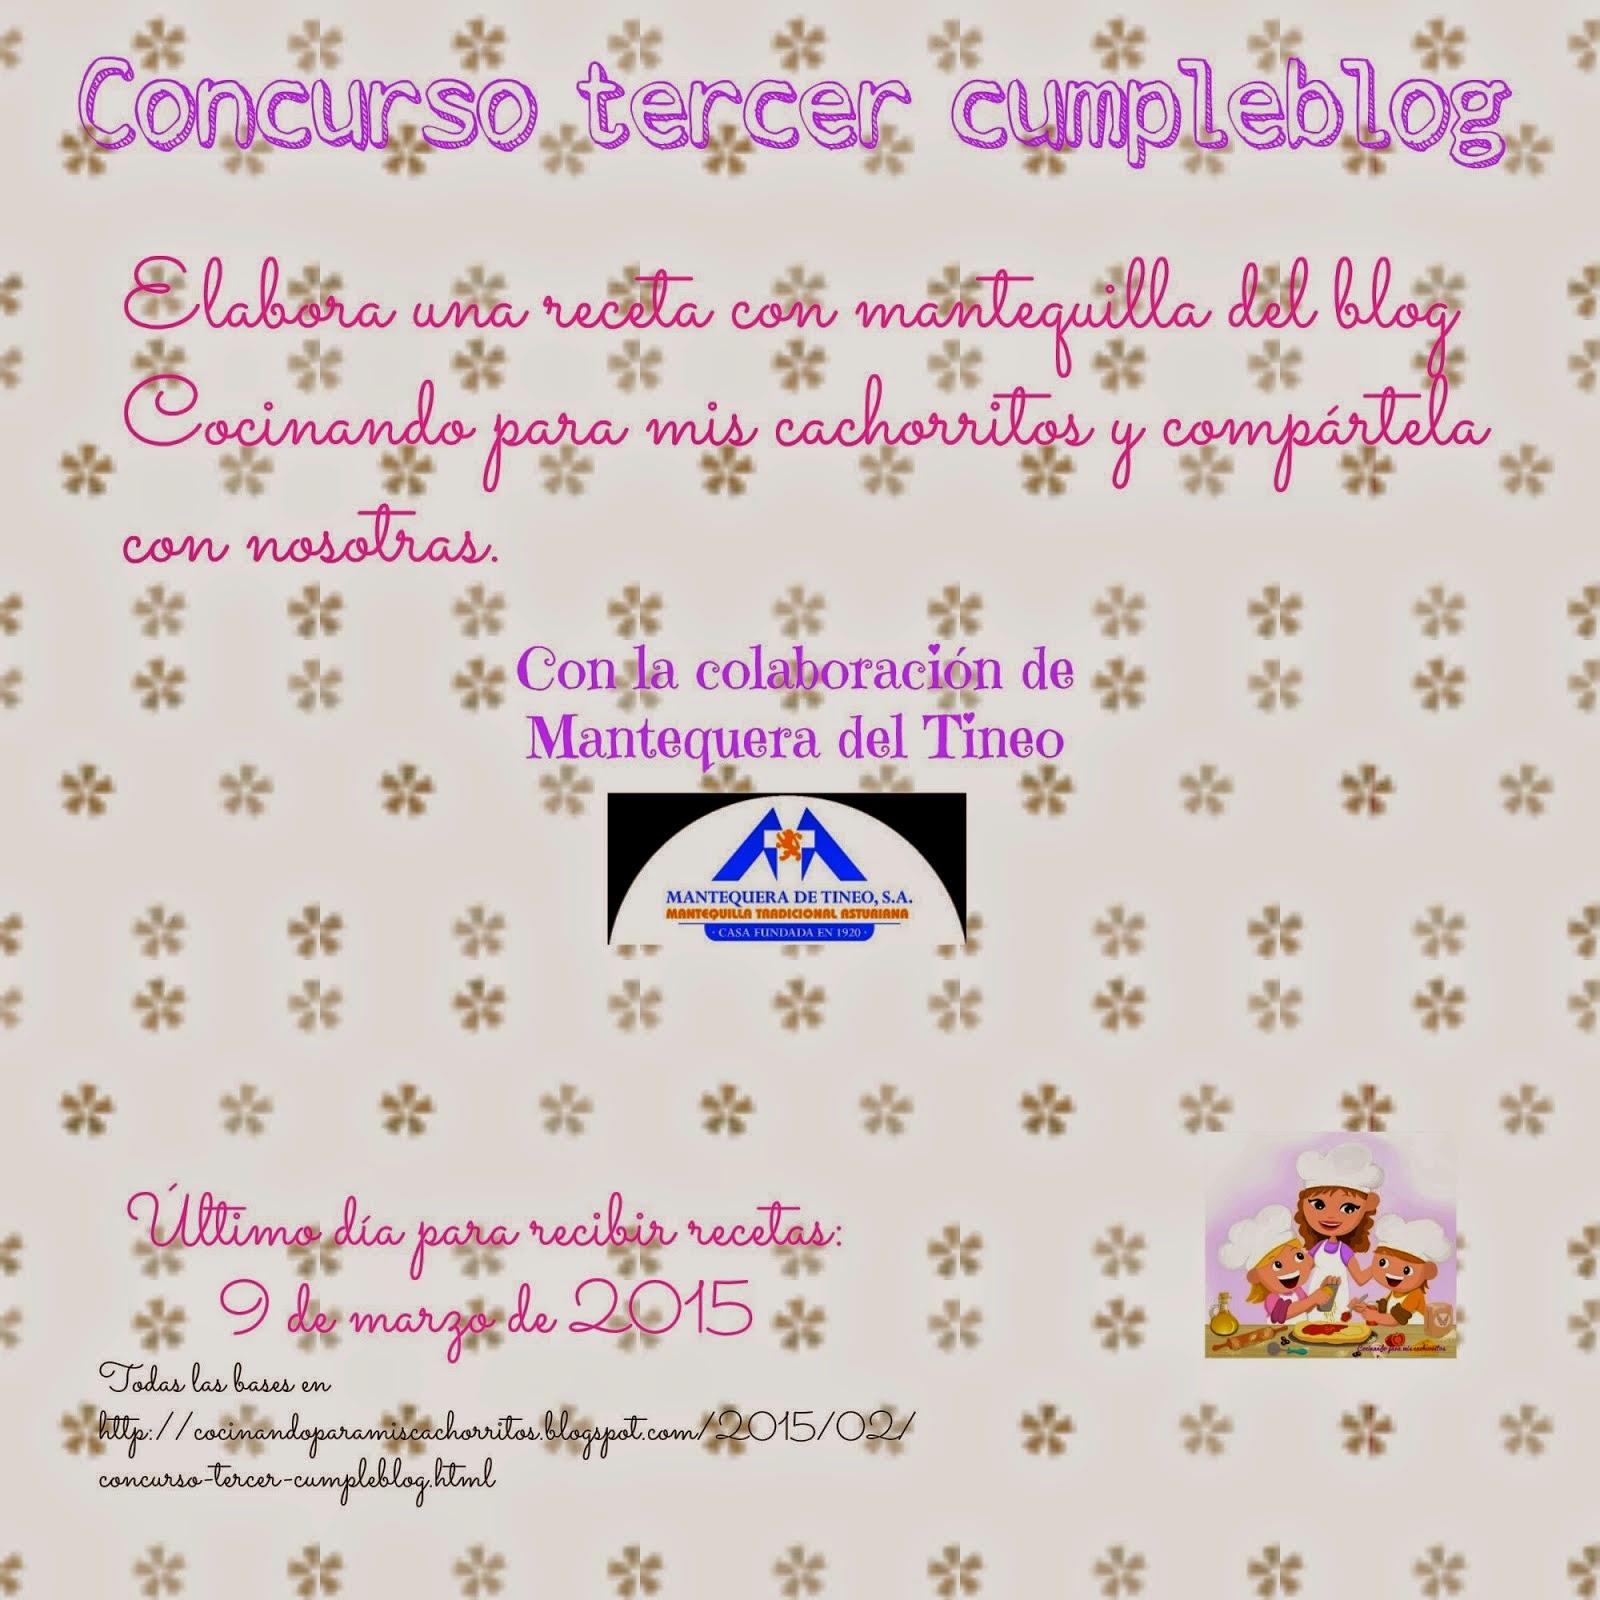 http://cocinandoparamiscachorritos.blogspot.com.es/2015/02/concurso-tercer-cumpleblog.html